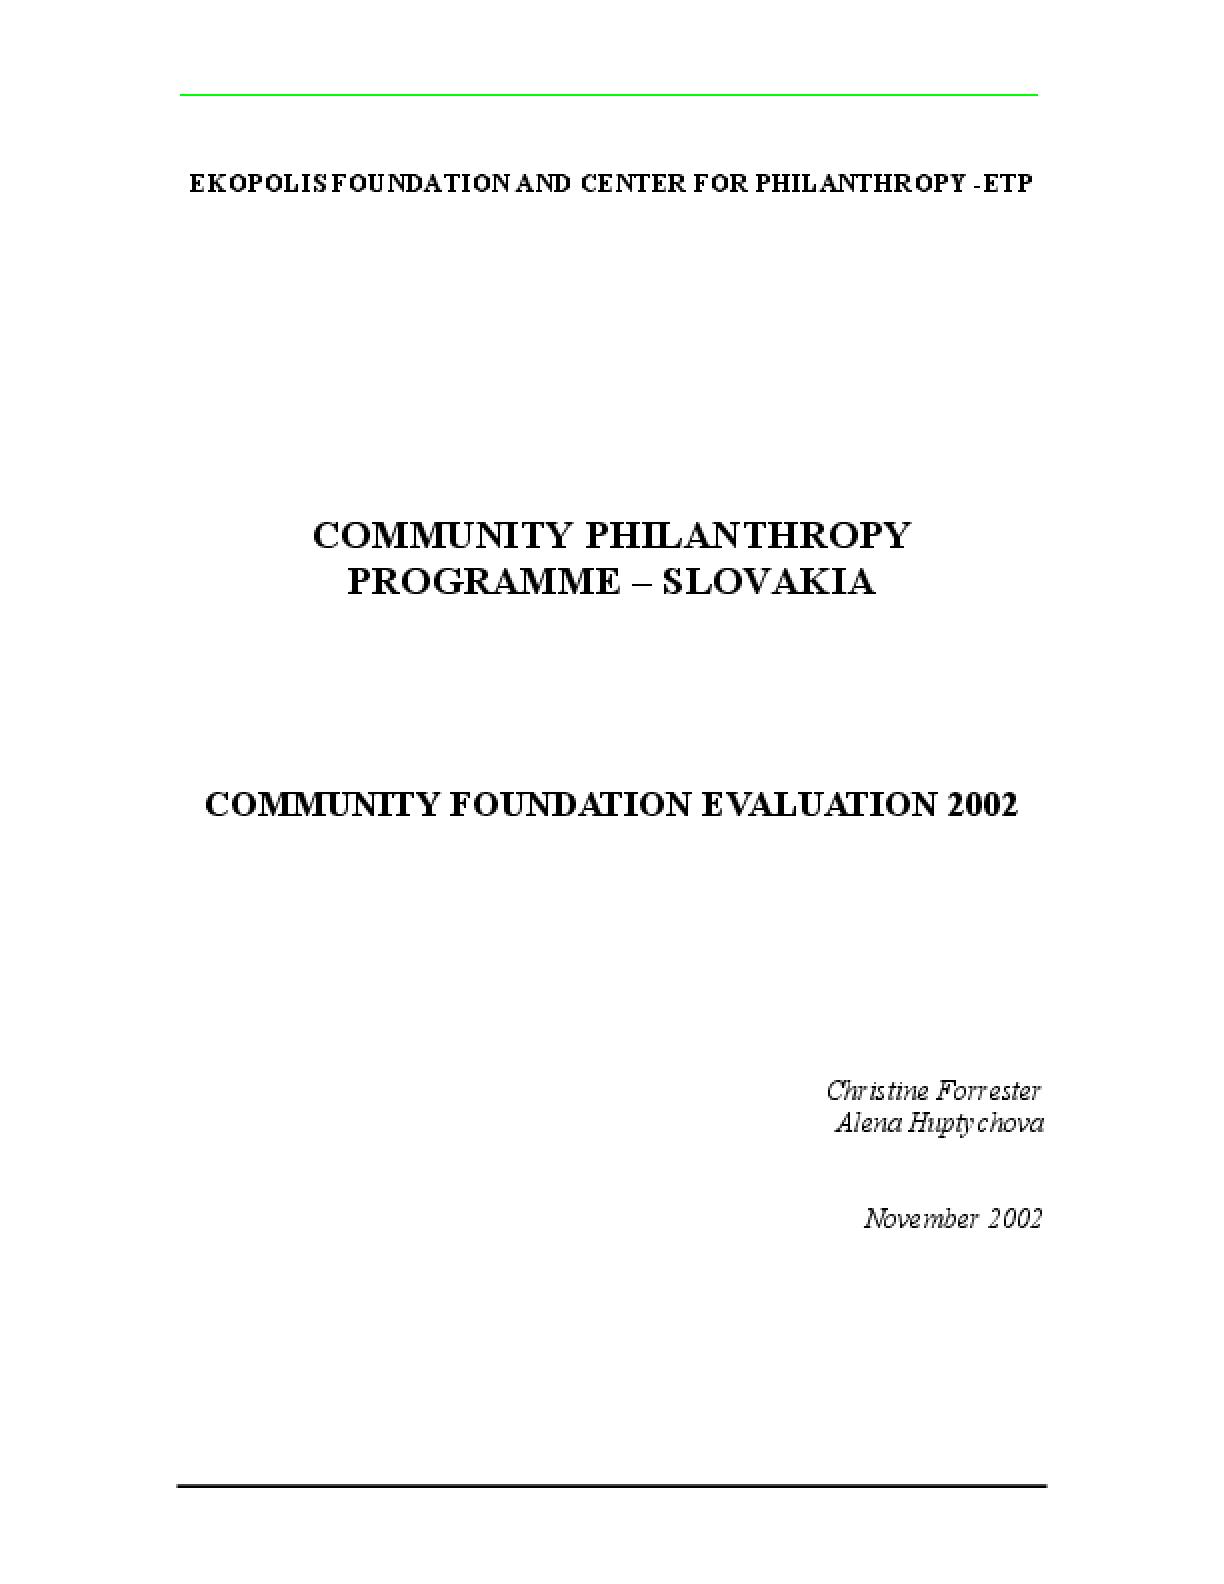 Community Philanthropy Programme - Slovakia: Community Foundations Evaluation 2002